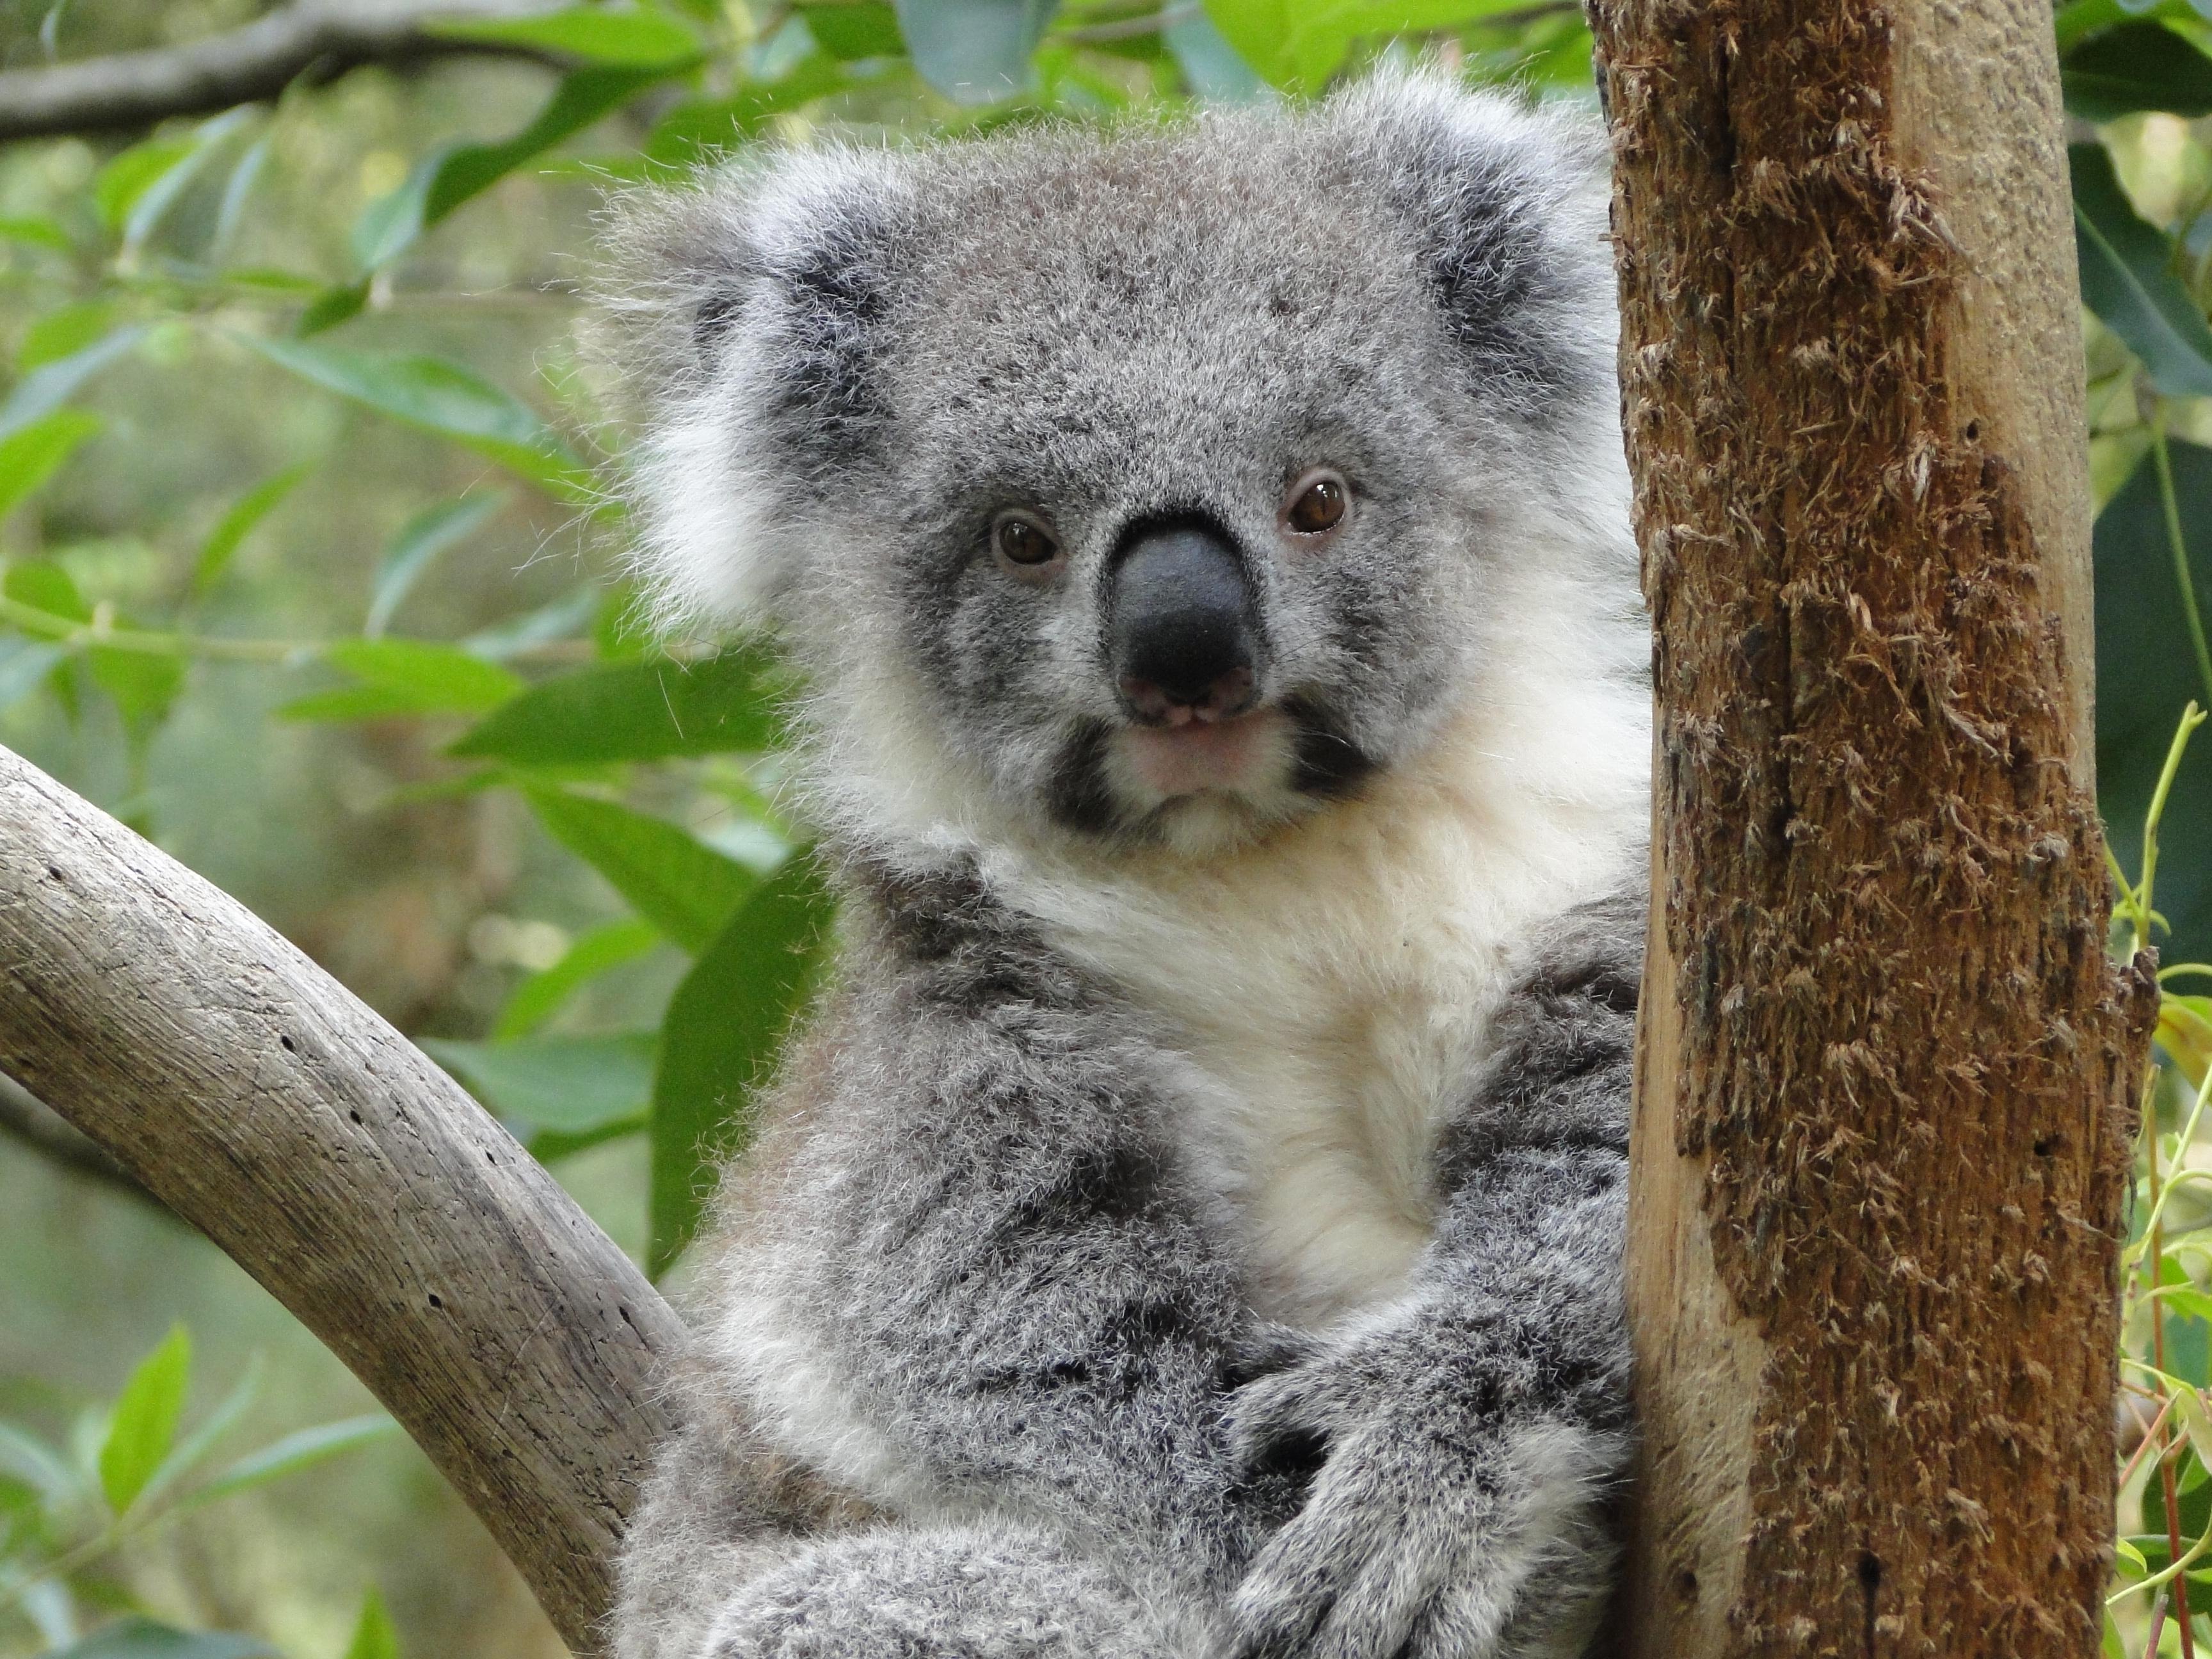 smiling koala picture - HD3456×2592